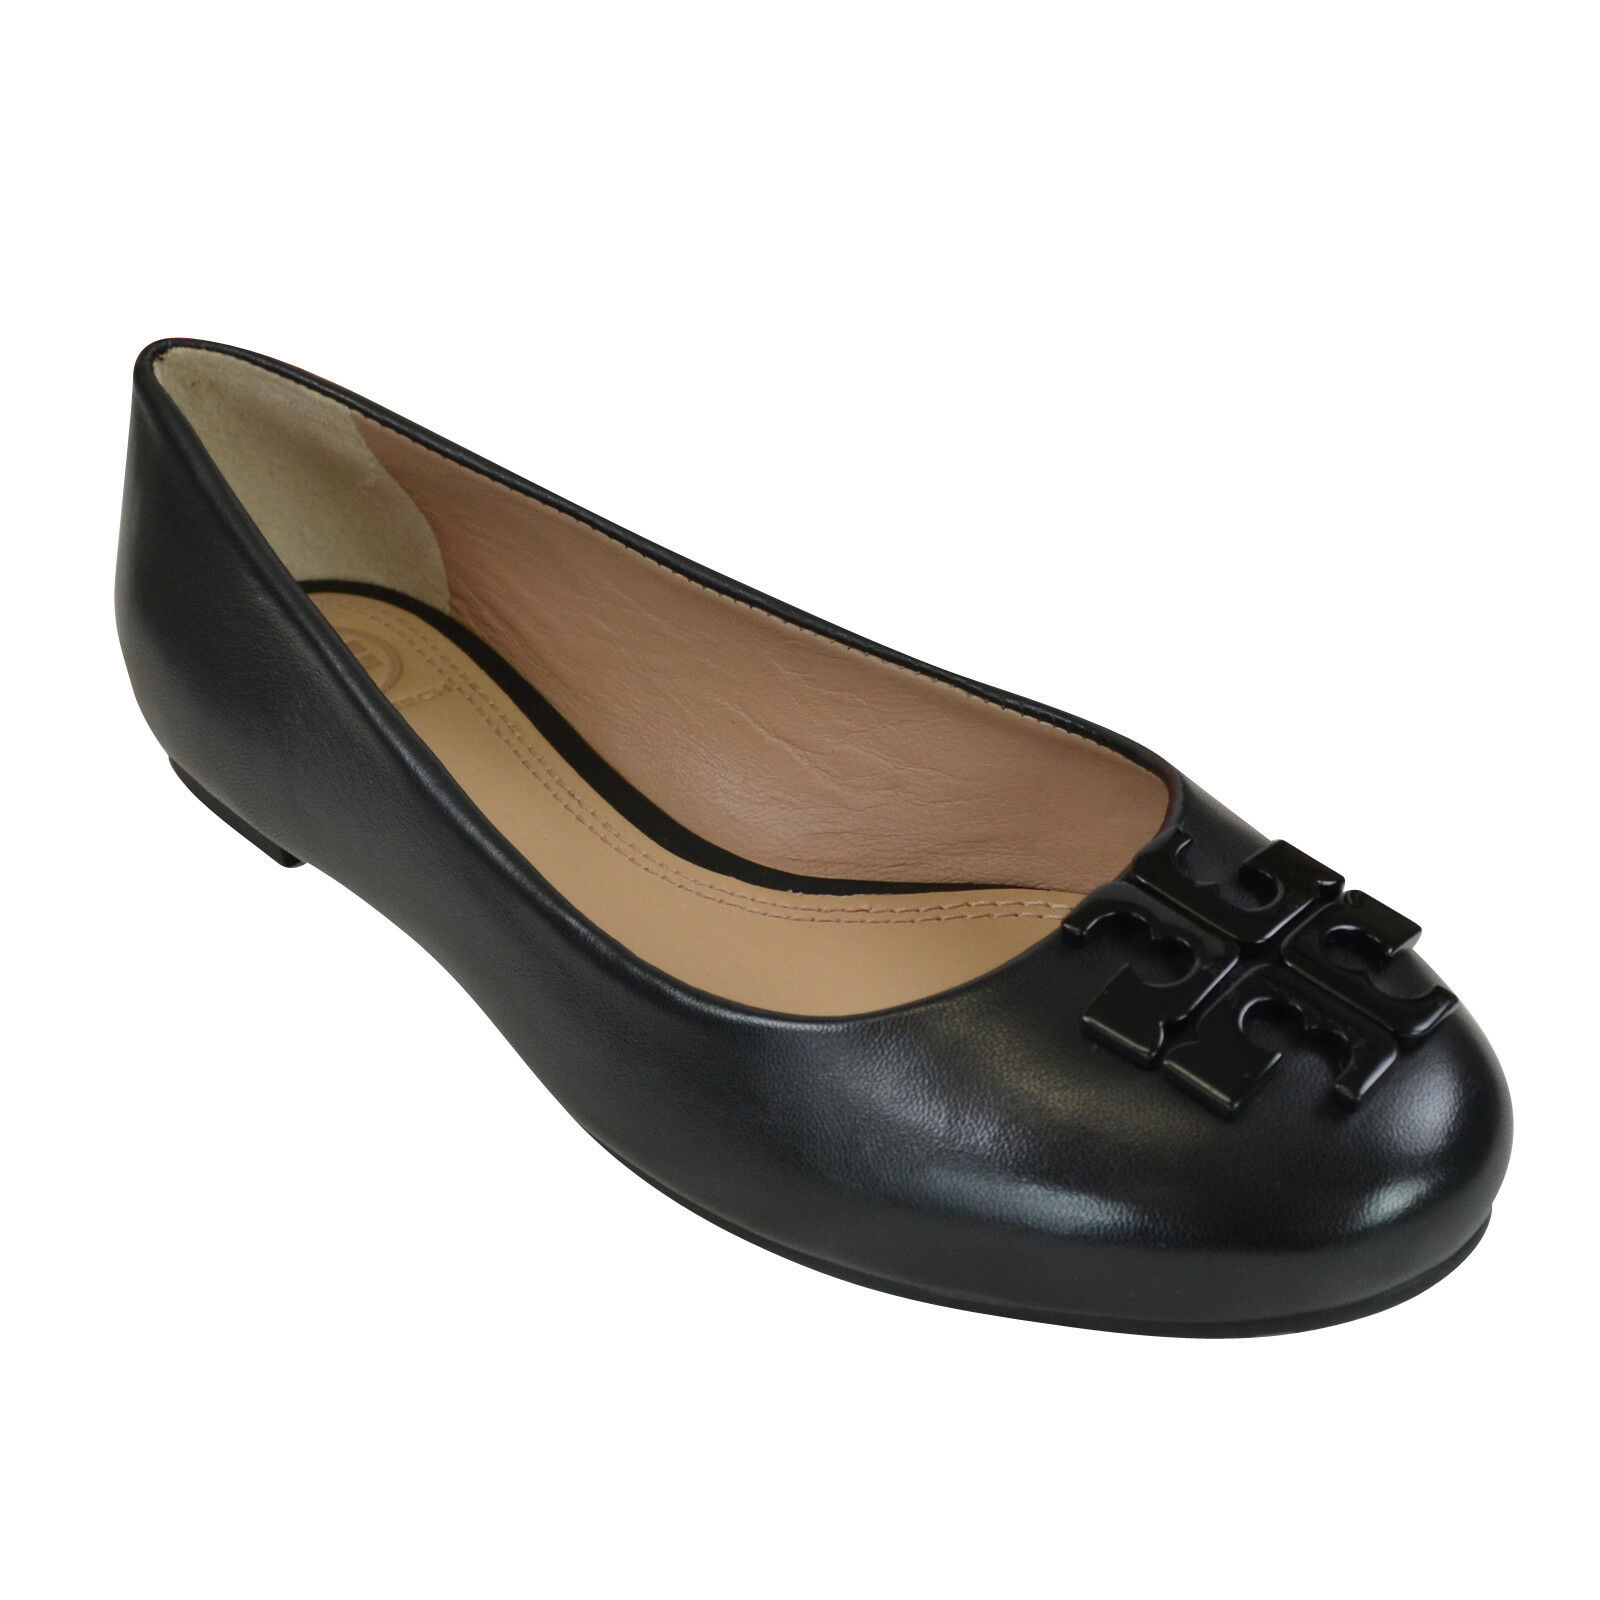 NIB Tory Burch LOWELL 2 Leather Ballet Flats in Black 6-9.5